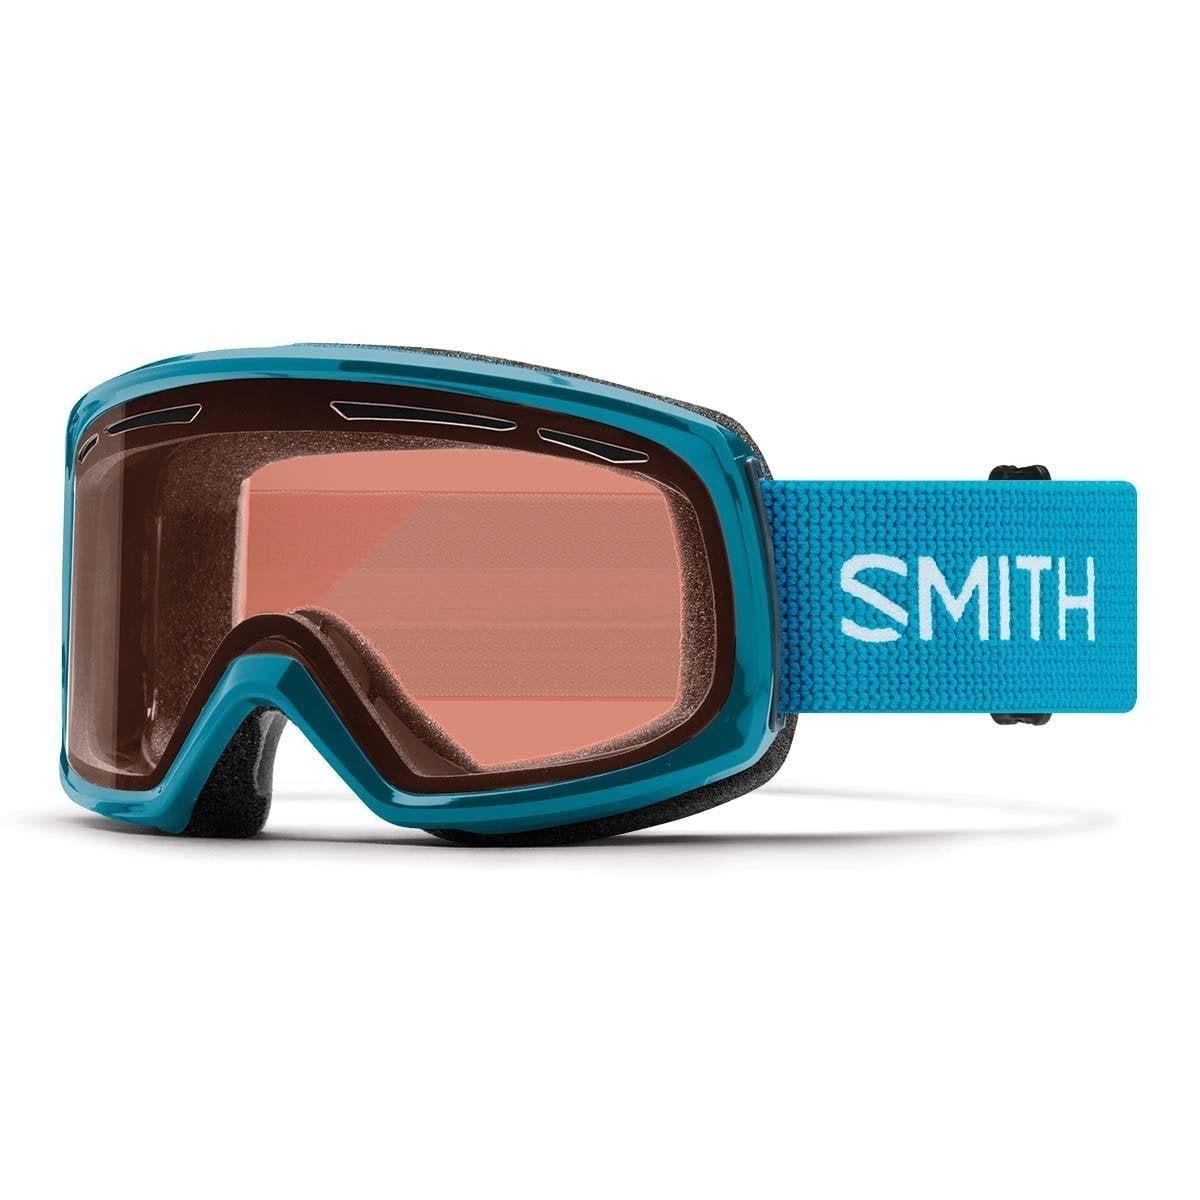 SMITH Women's Drift Snow Goggles by Smith Optics